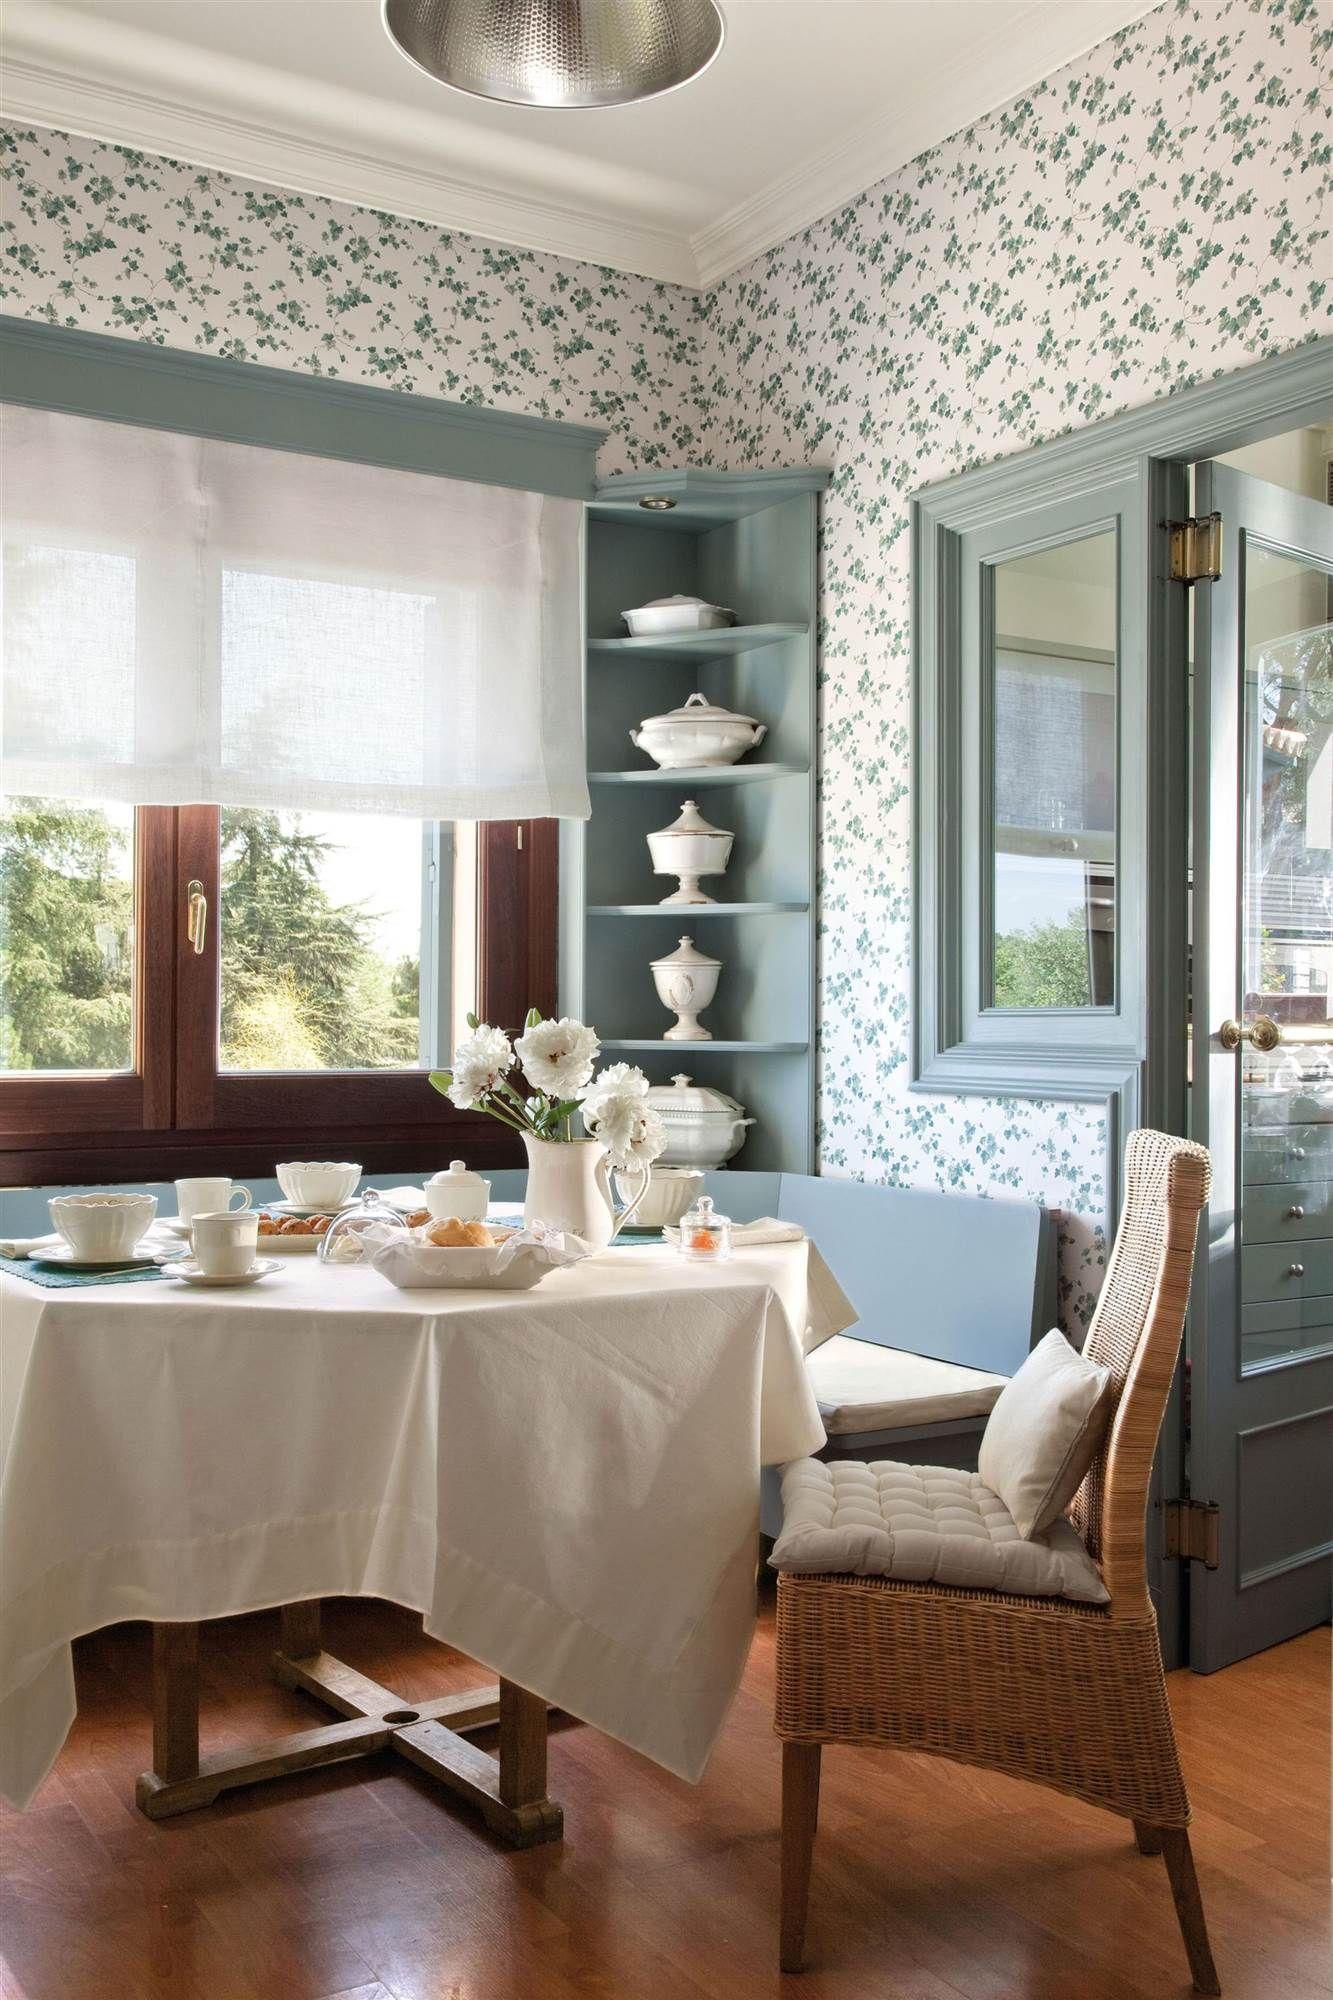 cocina con papel pintado y marcos pintados_00276446   Papel pintado ...